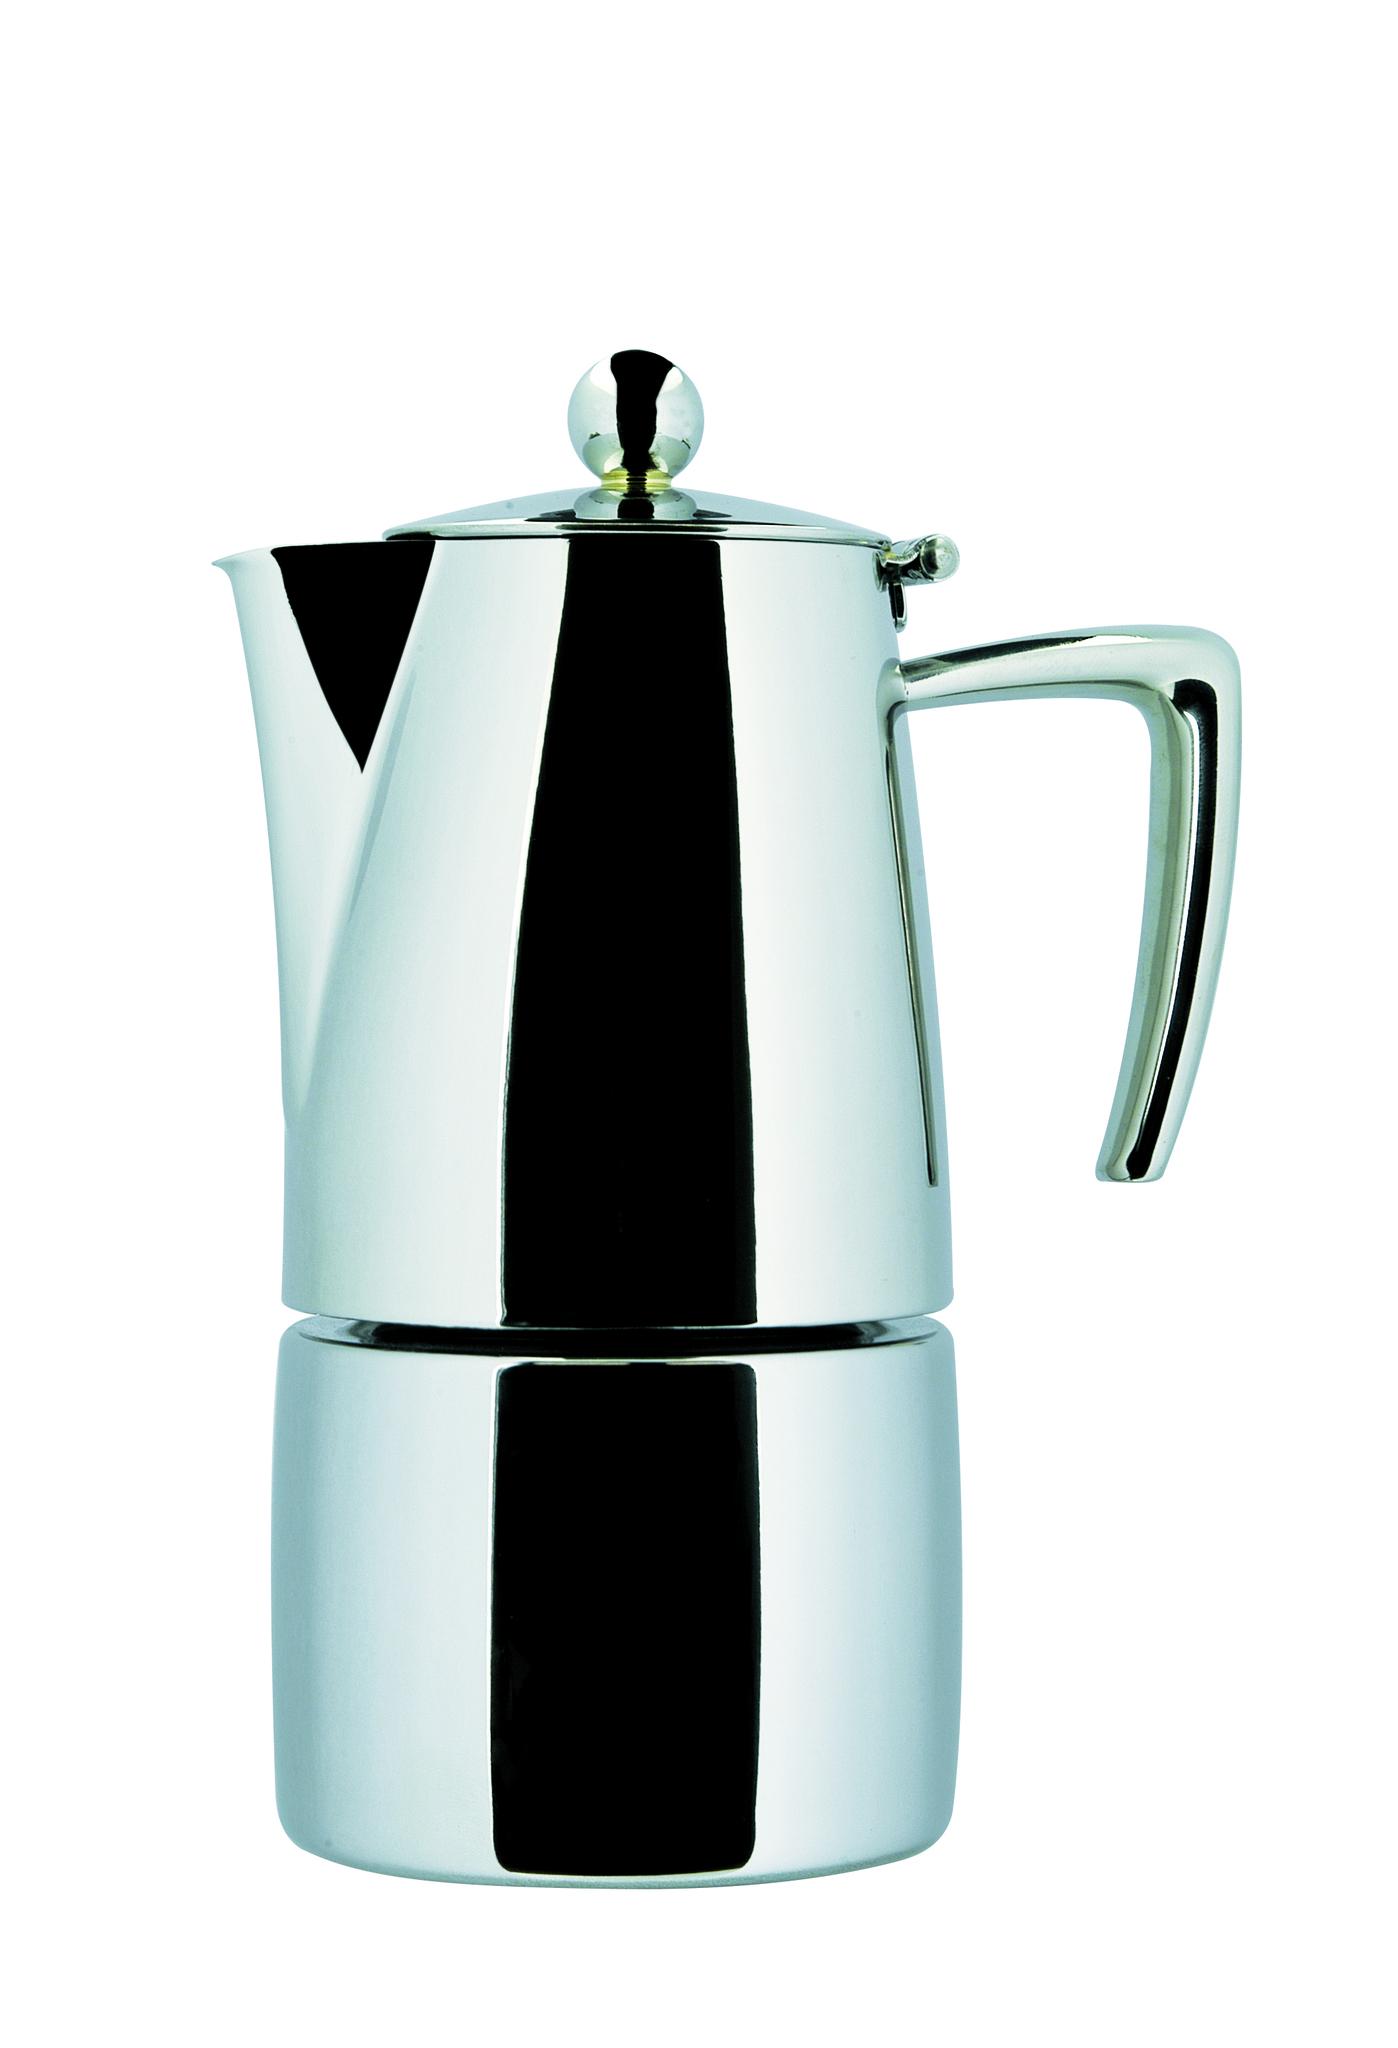 "ILSA Espressokocher ""Slancio"" aus Edelstahl 35cl / 6 Tassen"